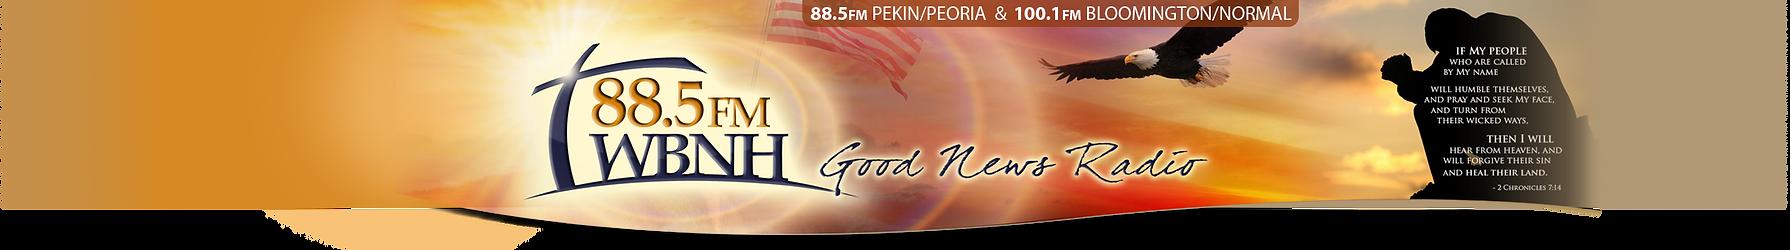 Header-WBNH-Master-patriotic.png